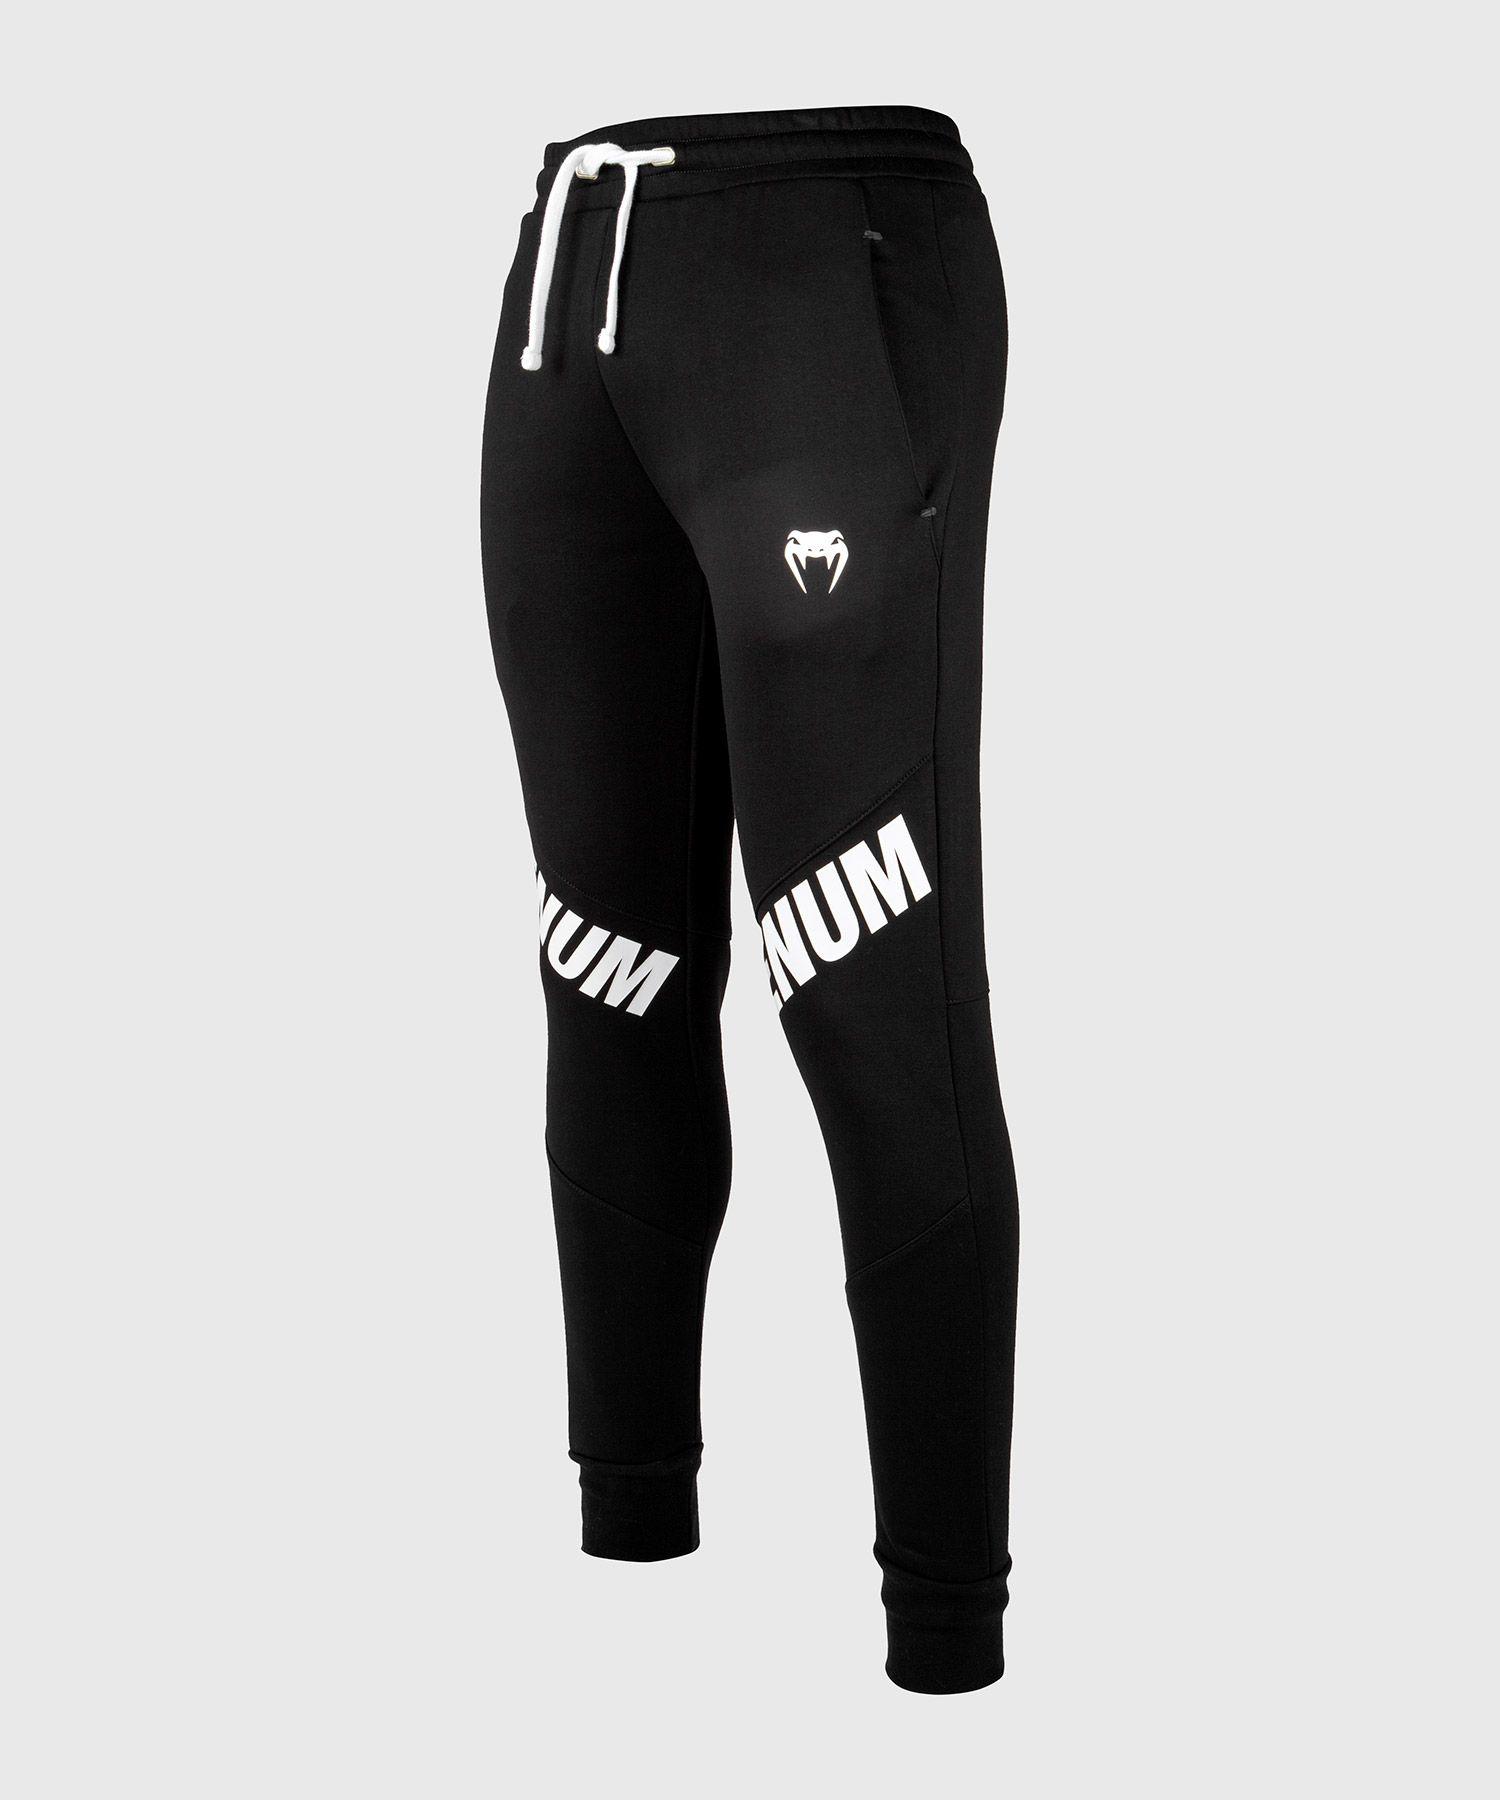 Pantaloni Tuta Venum Contender 3.0 - Neri